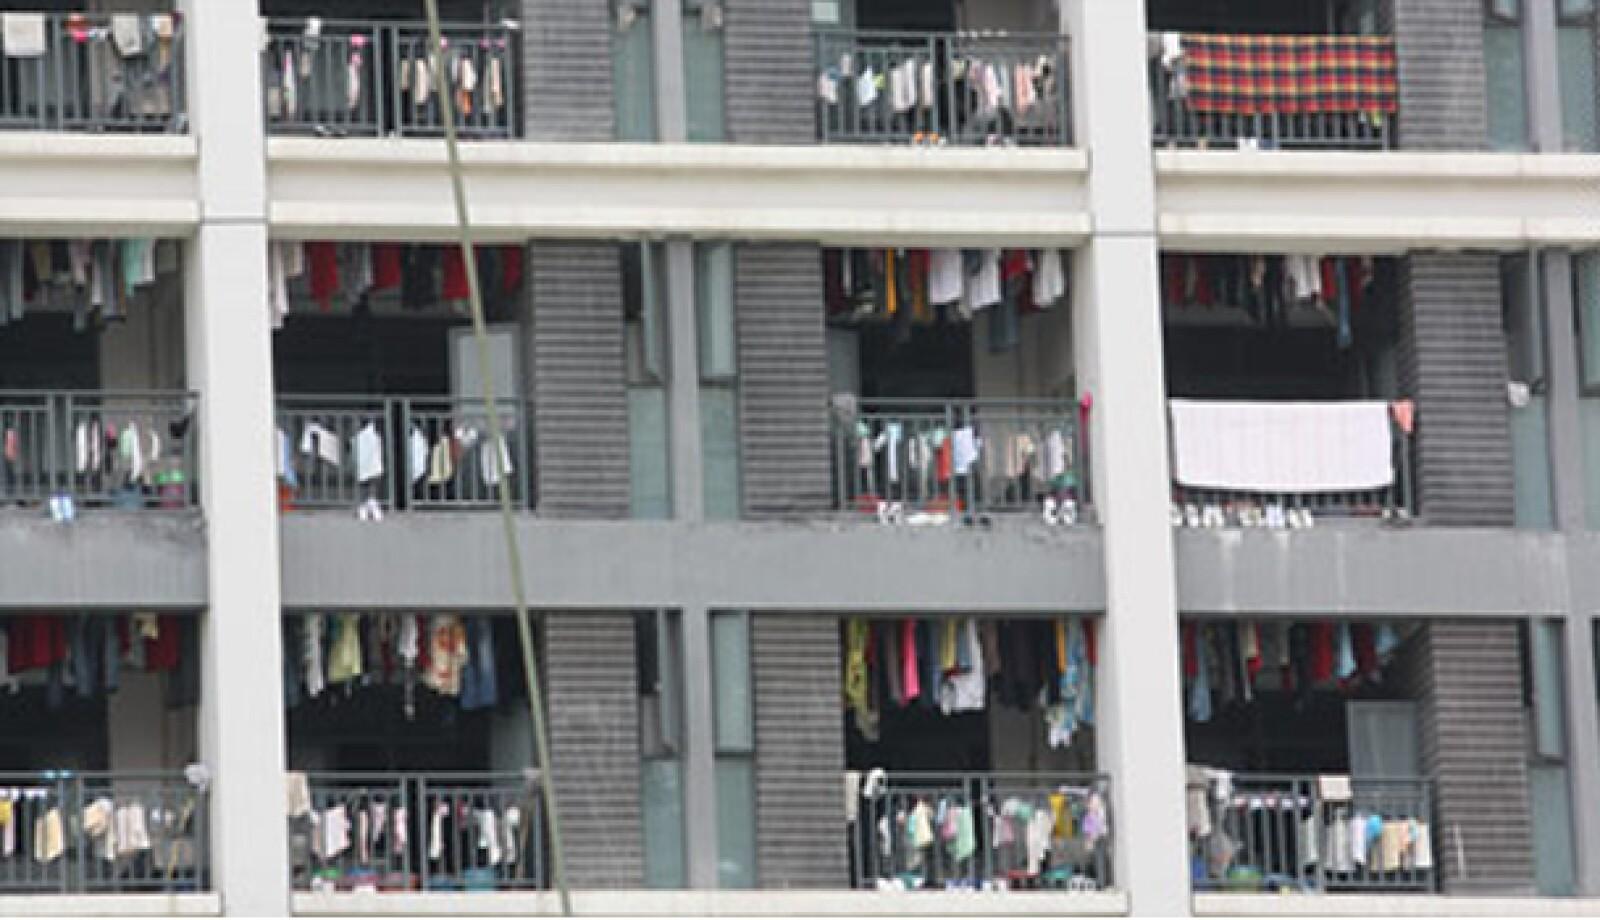 Edificios de viviendas en China